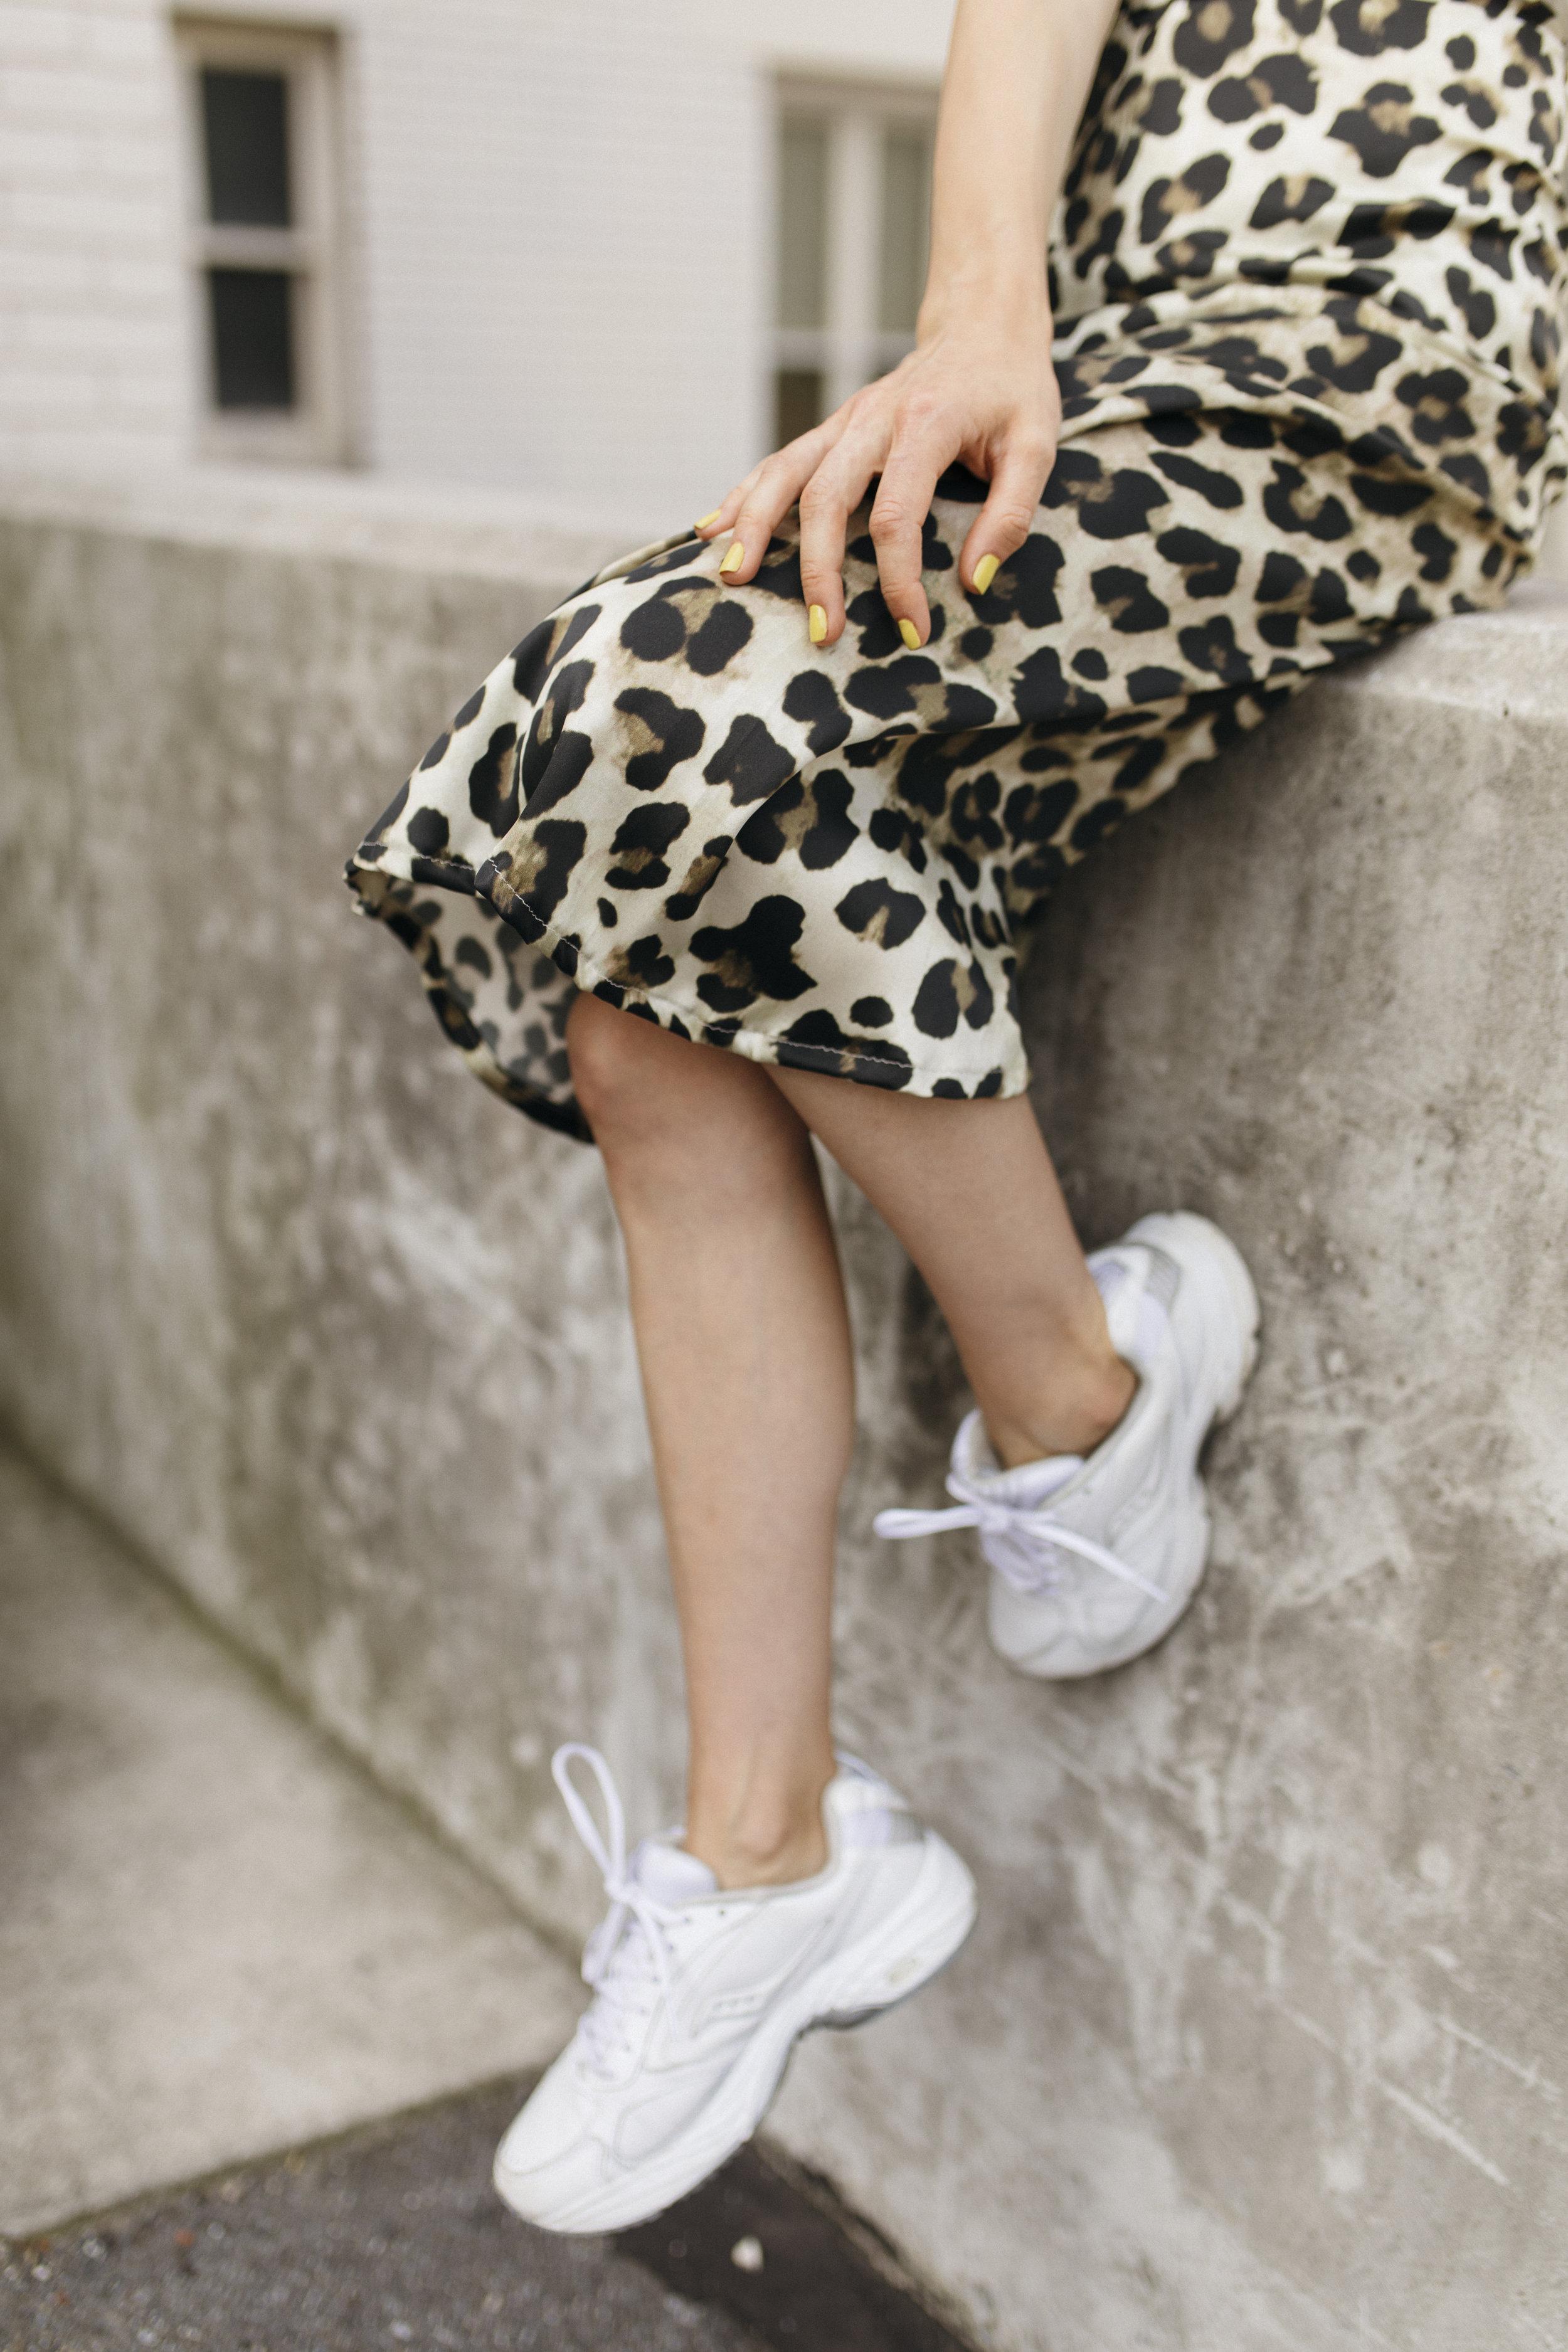 emilyrhess-blog-trends-fashion-leopard-cheetah-skirt-diy-naomi7.jpg